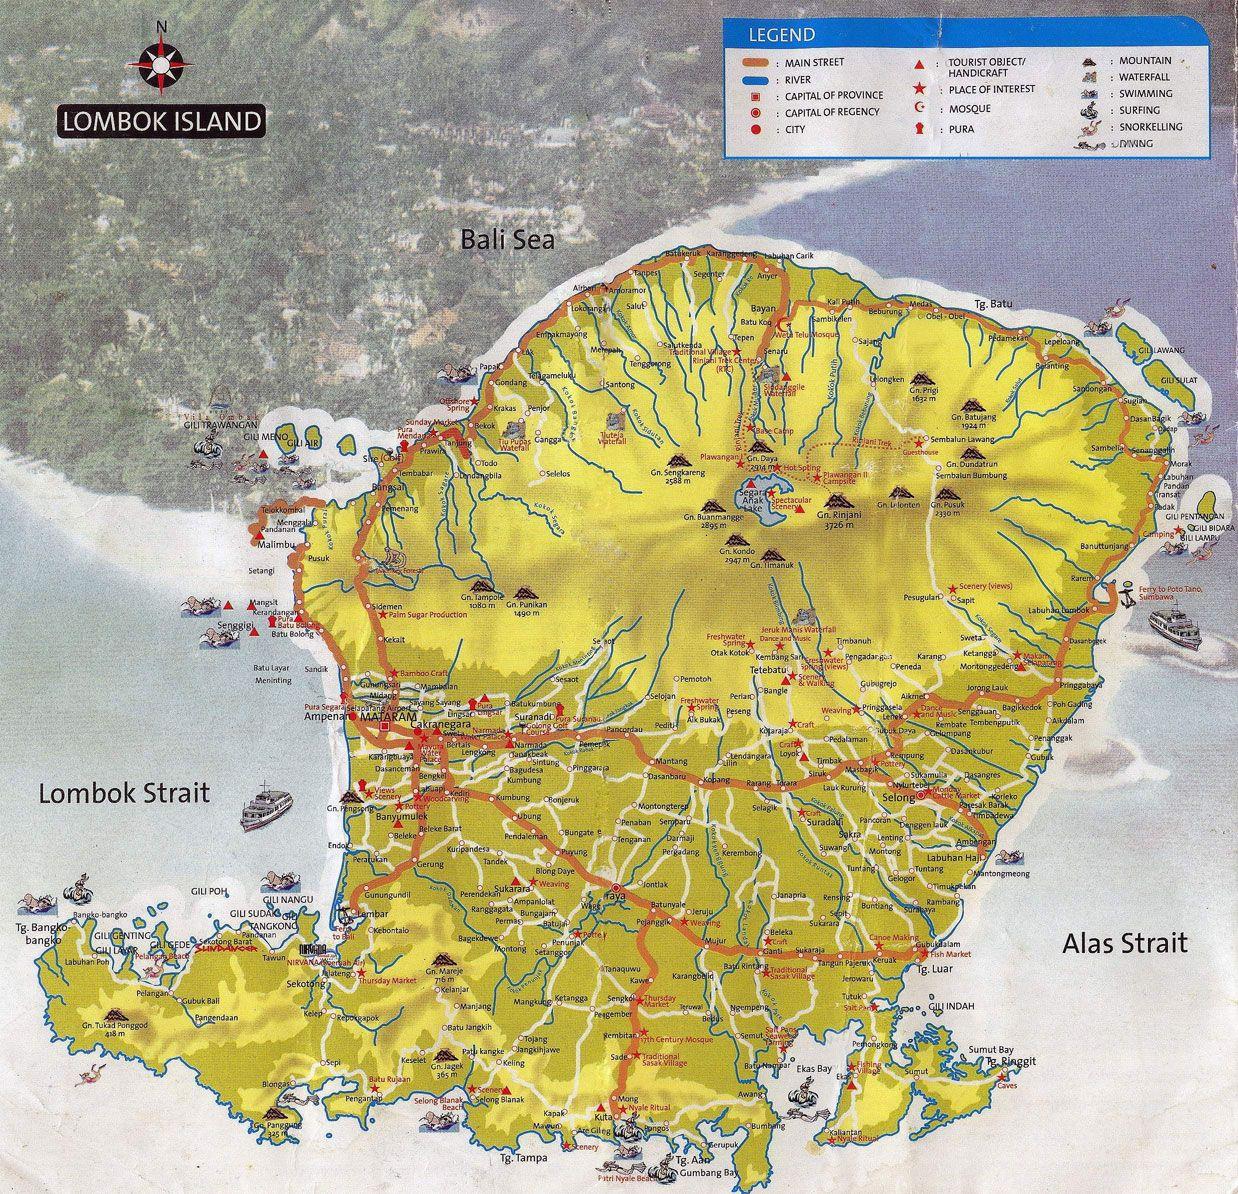 Aneka Wisata Pulau Lombok: Peta Wisata  Pulau lombok, Peta, Pulau